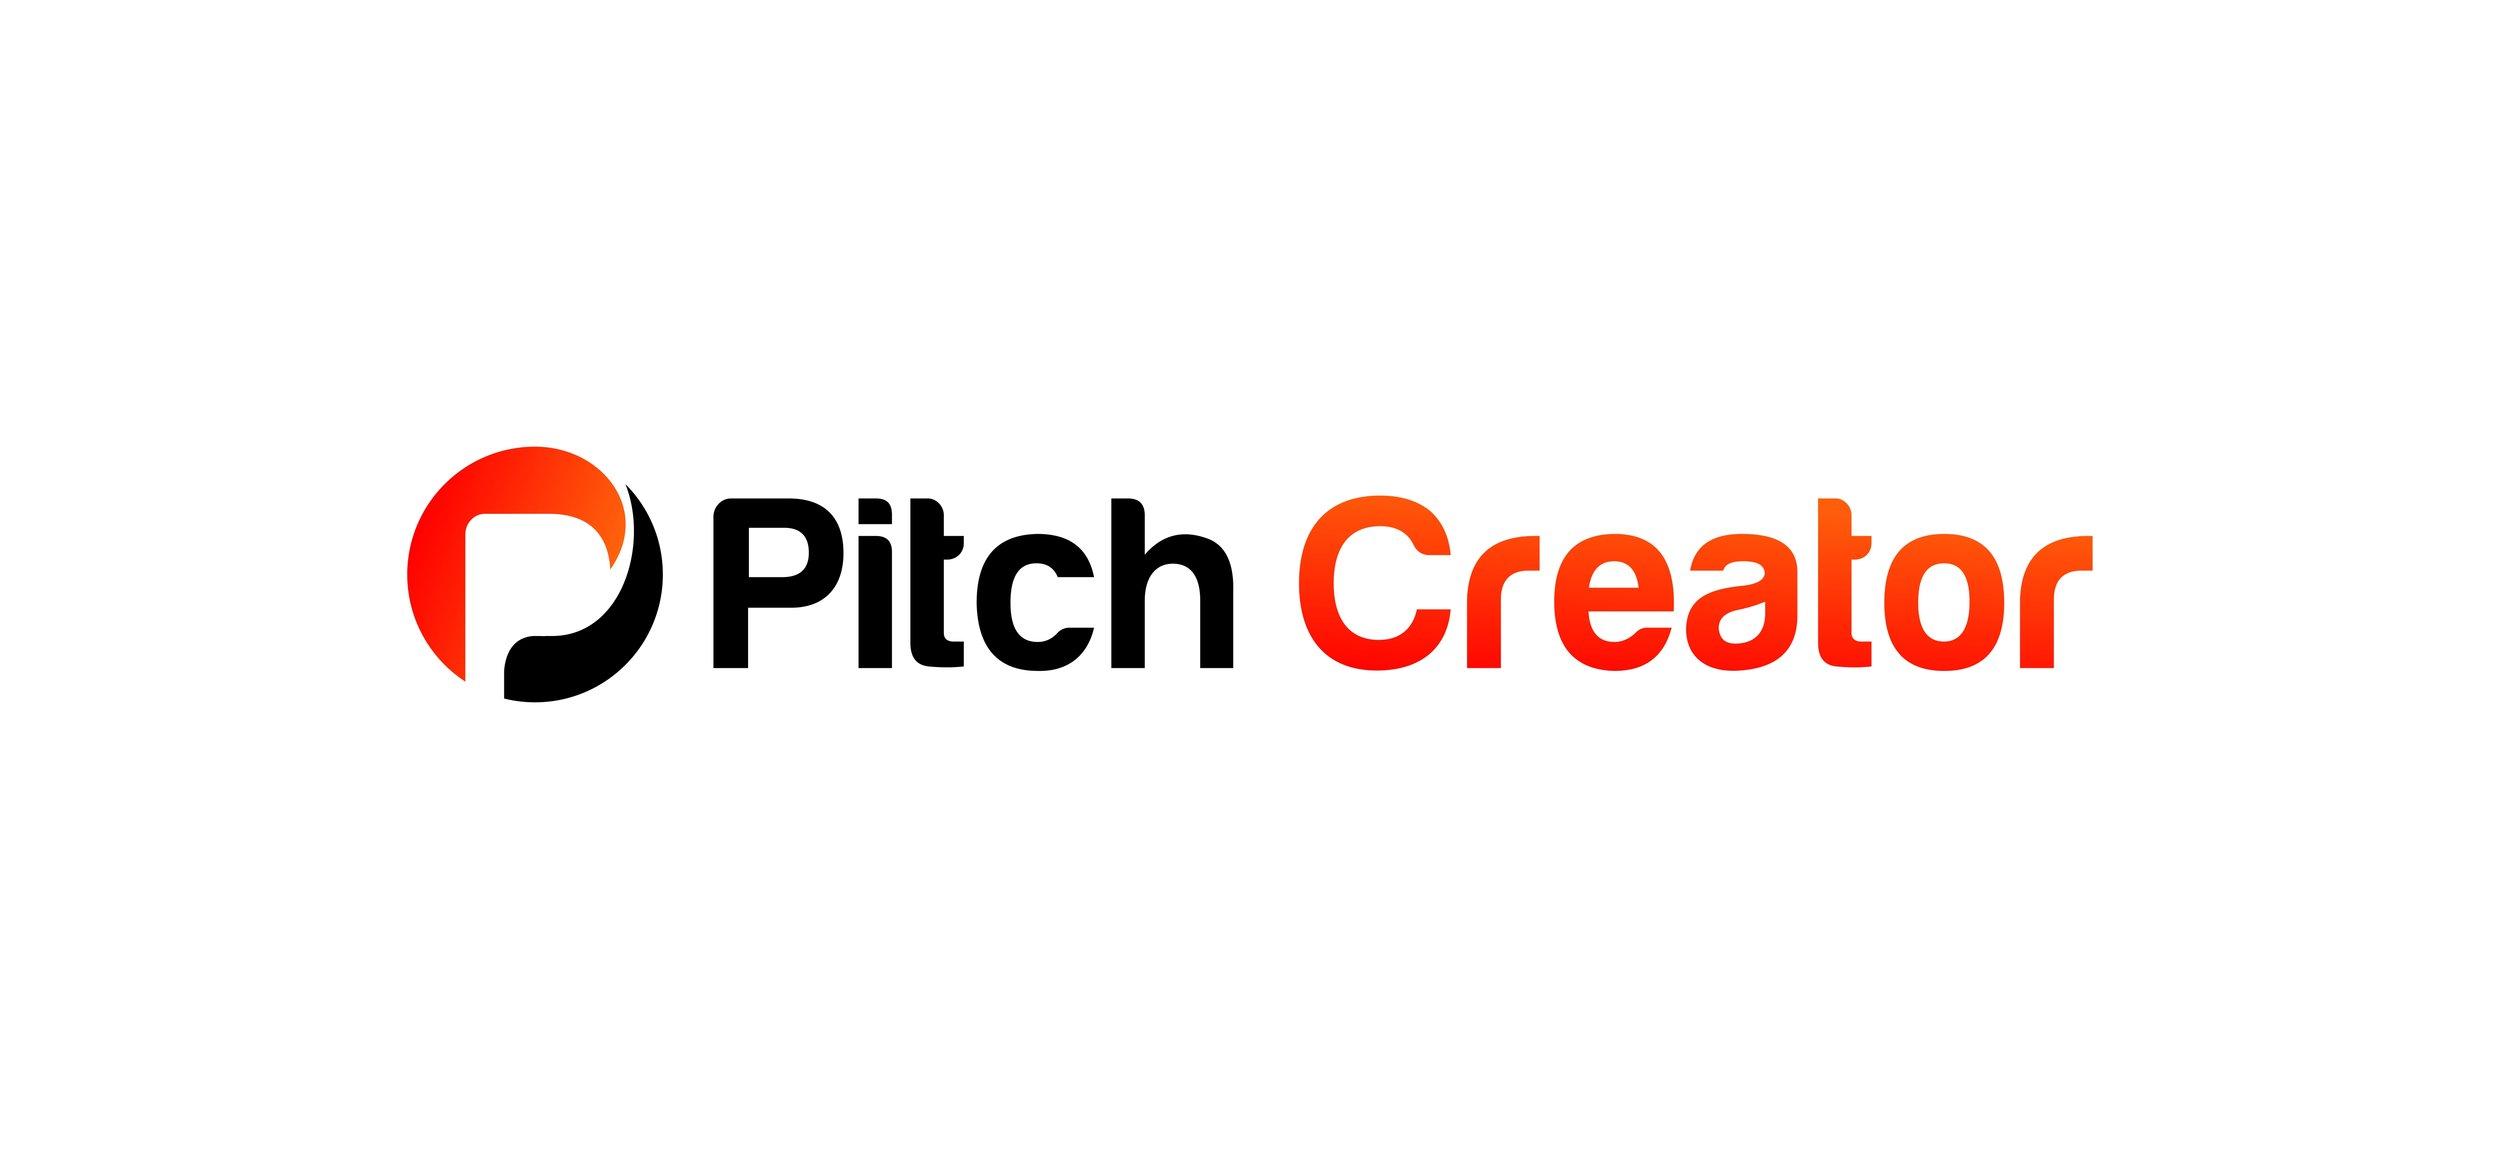 Pitch creator logo on white background.jpg